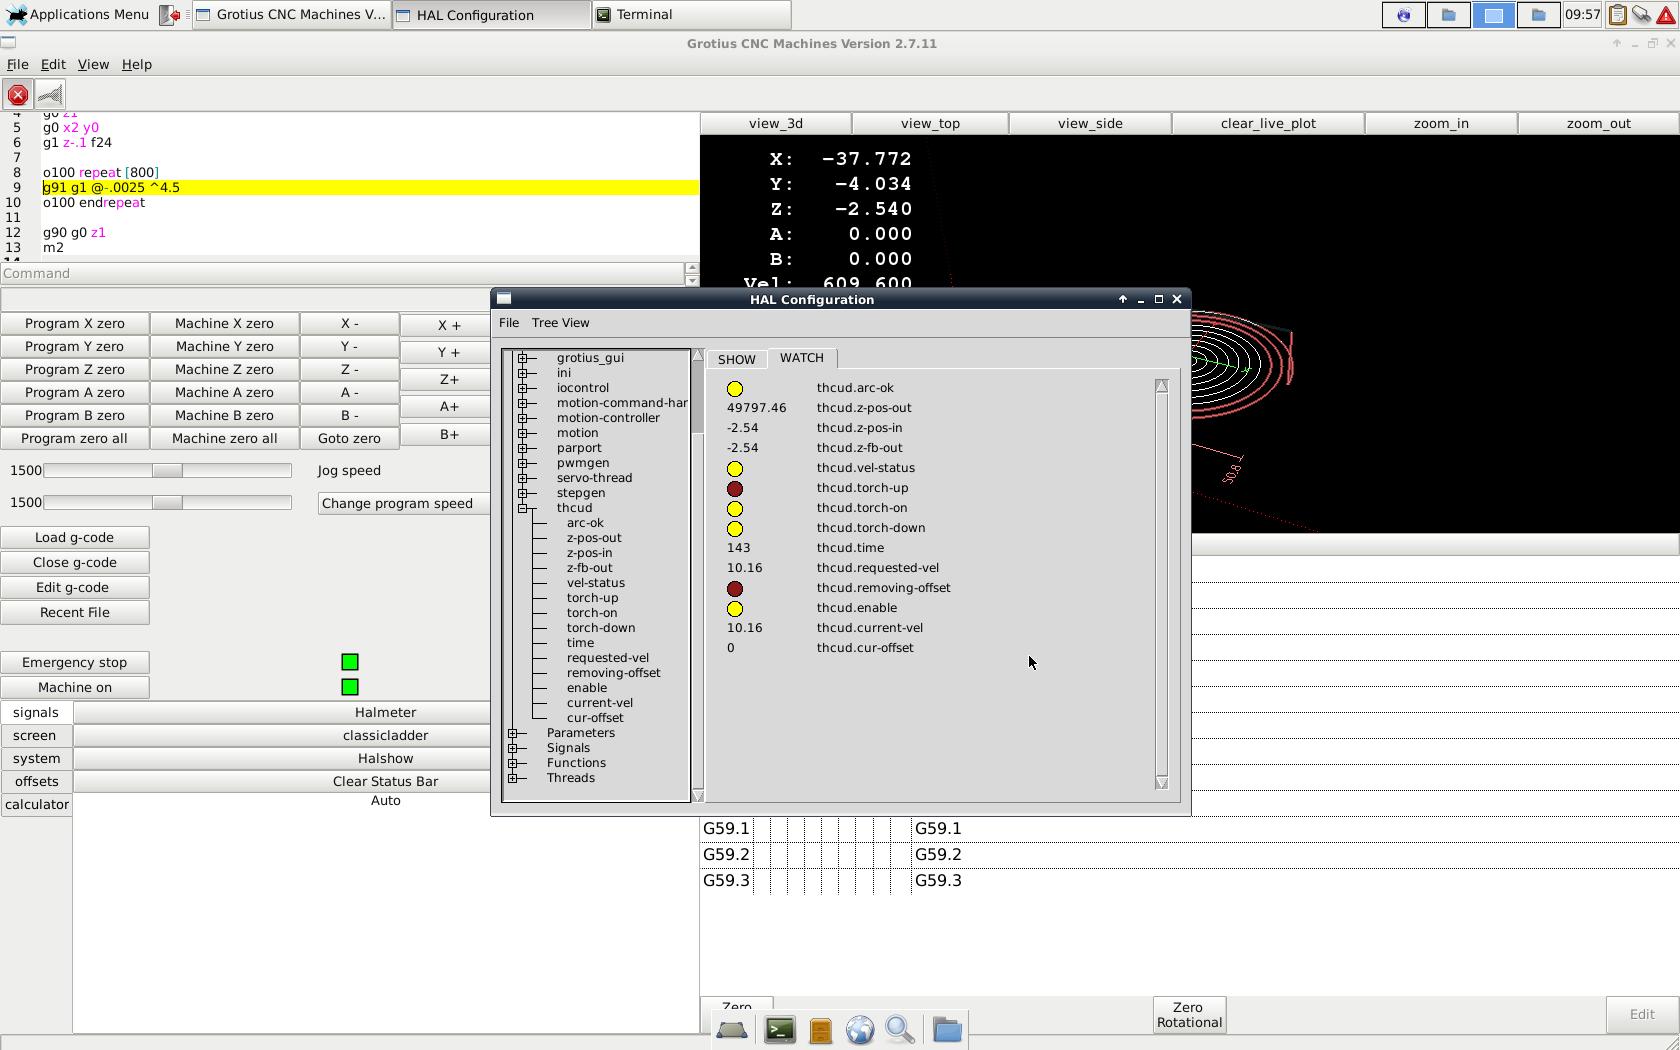 Screenshot-01032018-095743AM.png